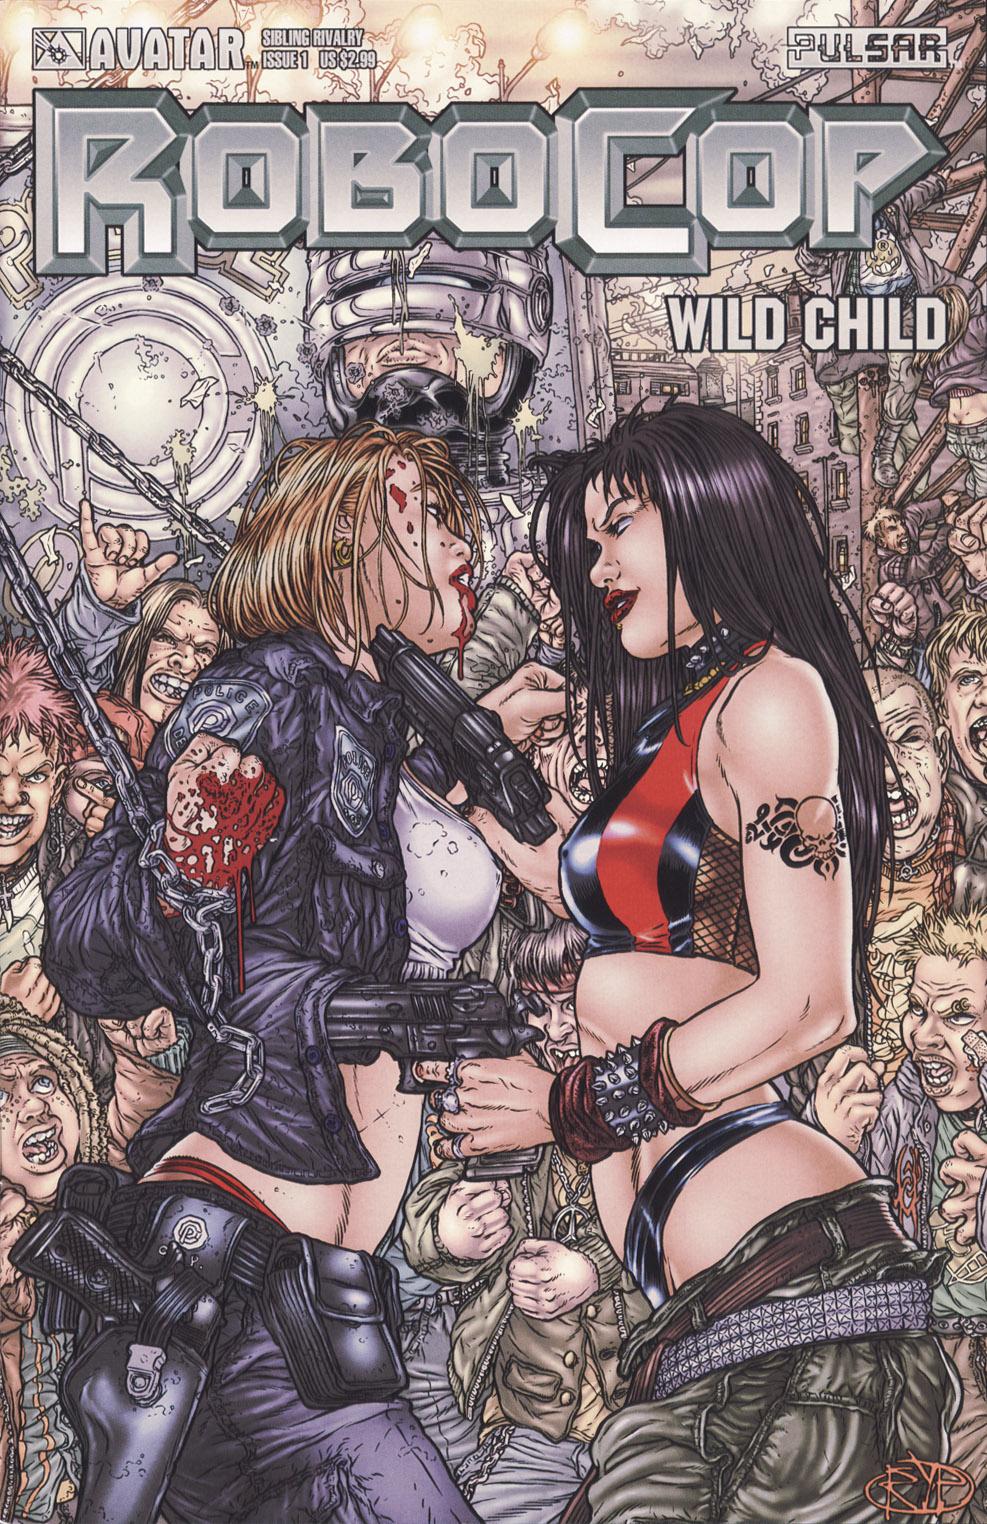 Read online Robocop: Wild Child comic -  Issue # Full - 2